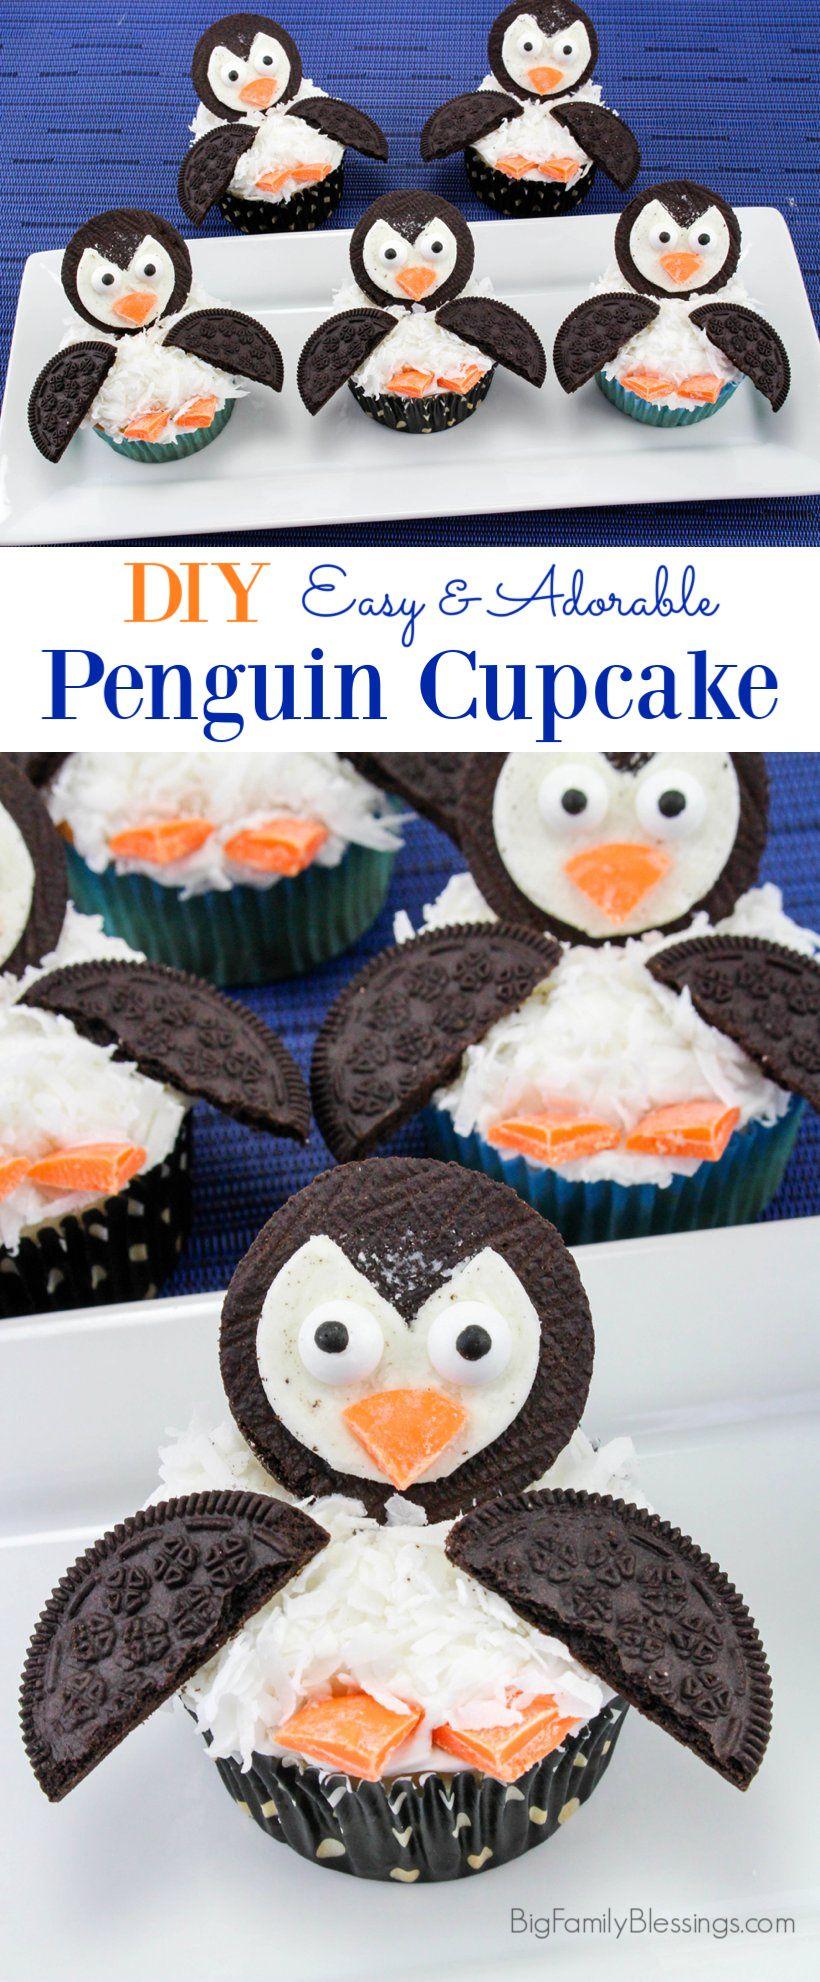 Easy & Adorable Penguin Cupcakes | Penguin cupcakes, New birthday ...